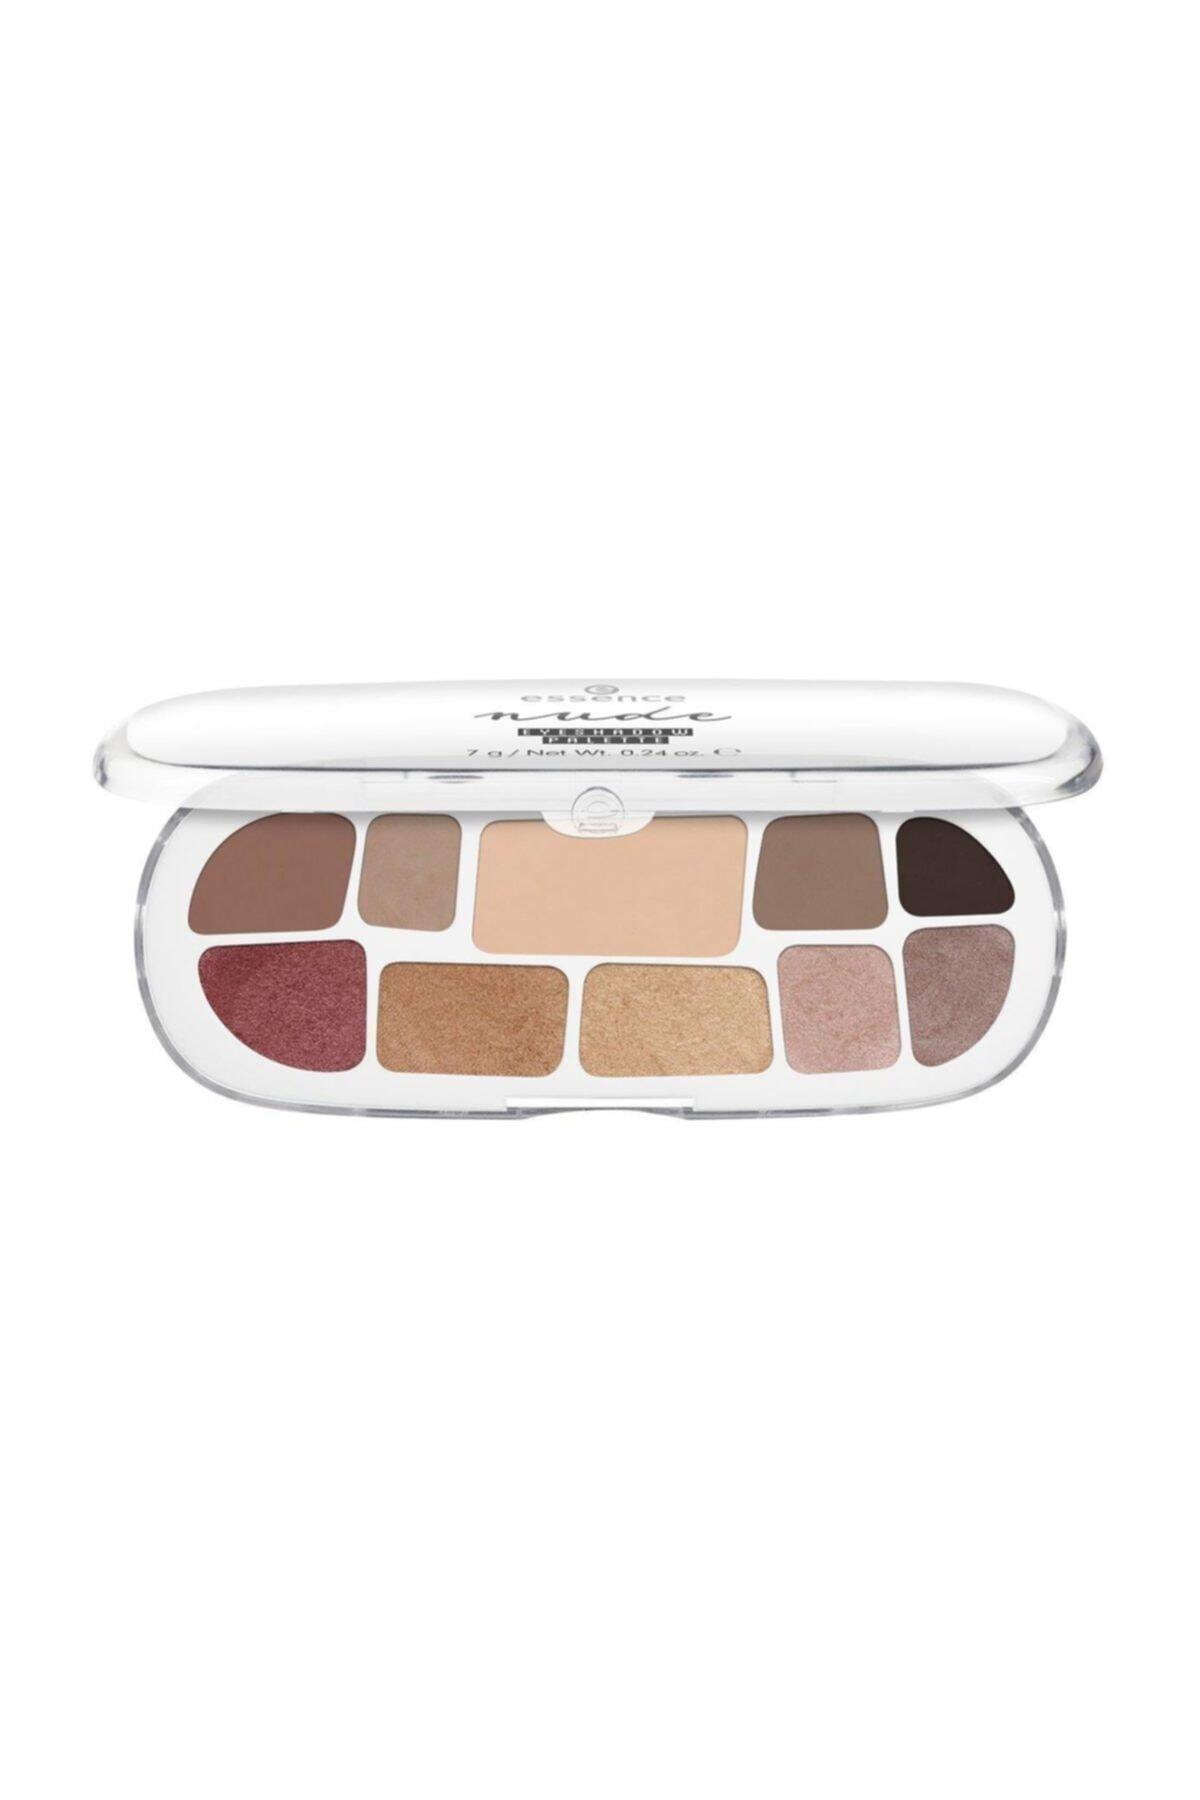 Essence Göz Farı Paleti - Eyeshadow Palette Nude 4059729198648 1